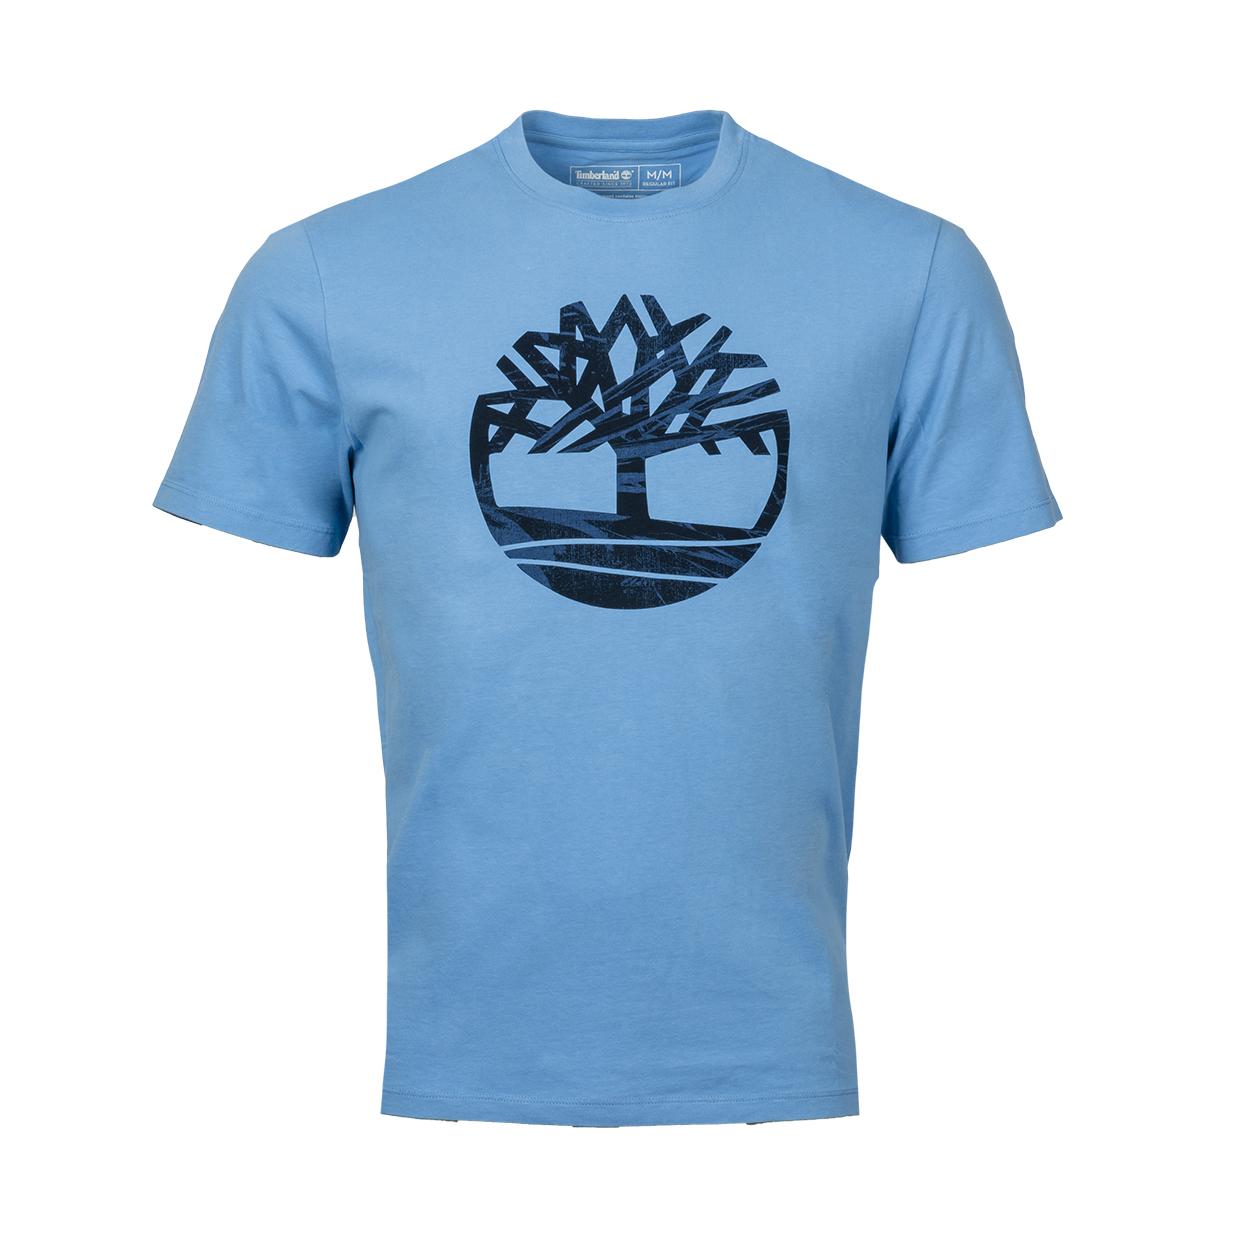 Tee-shirt col rond  en coton bleu ciel floqué bleu marine